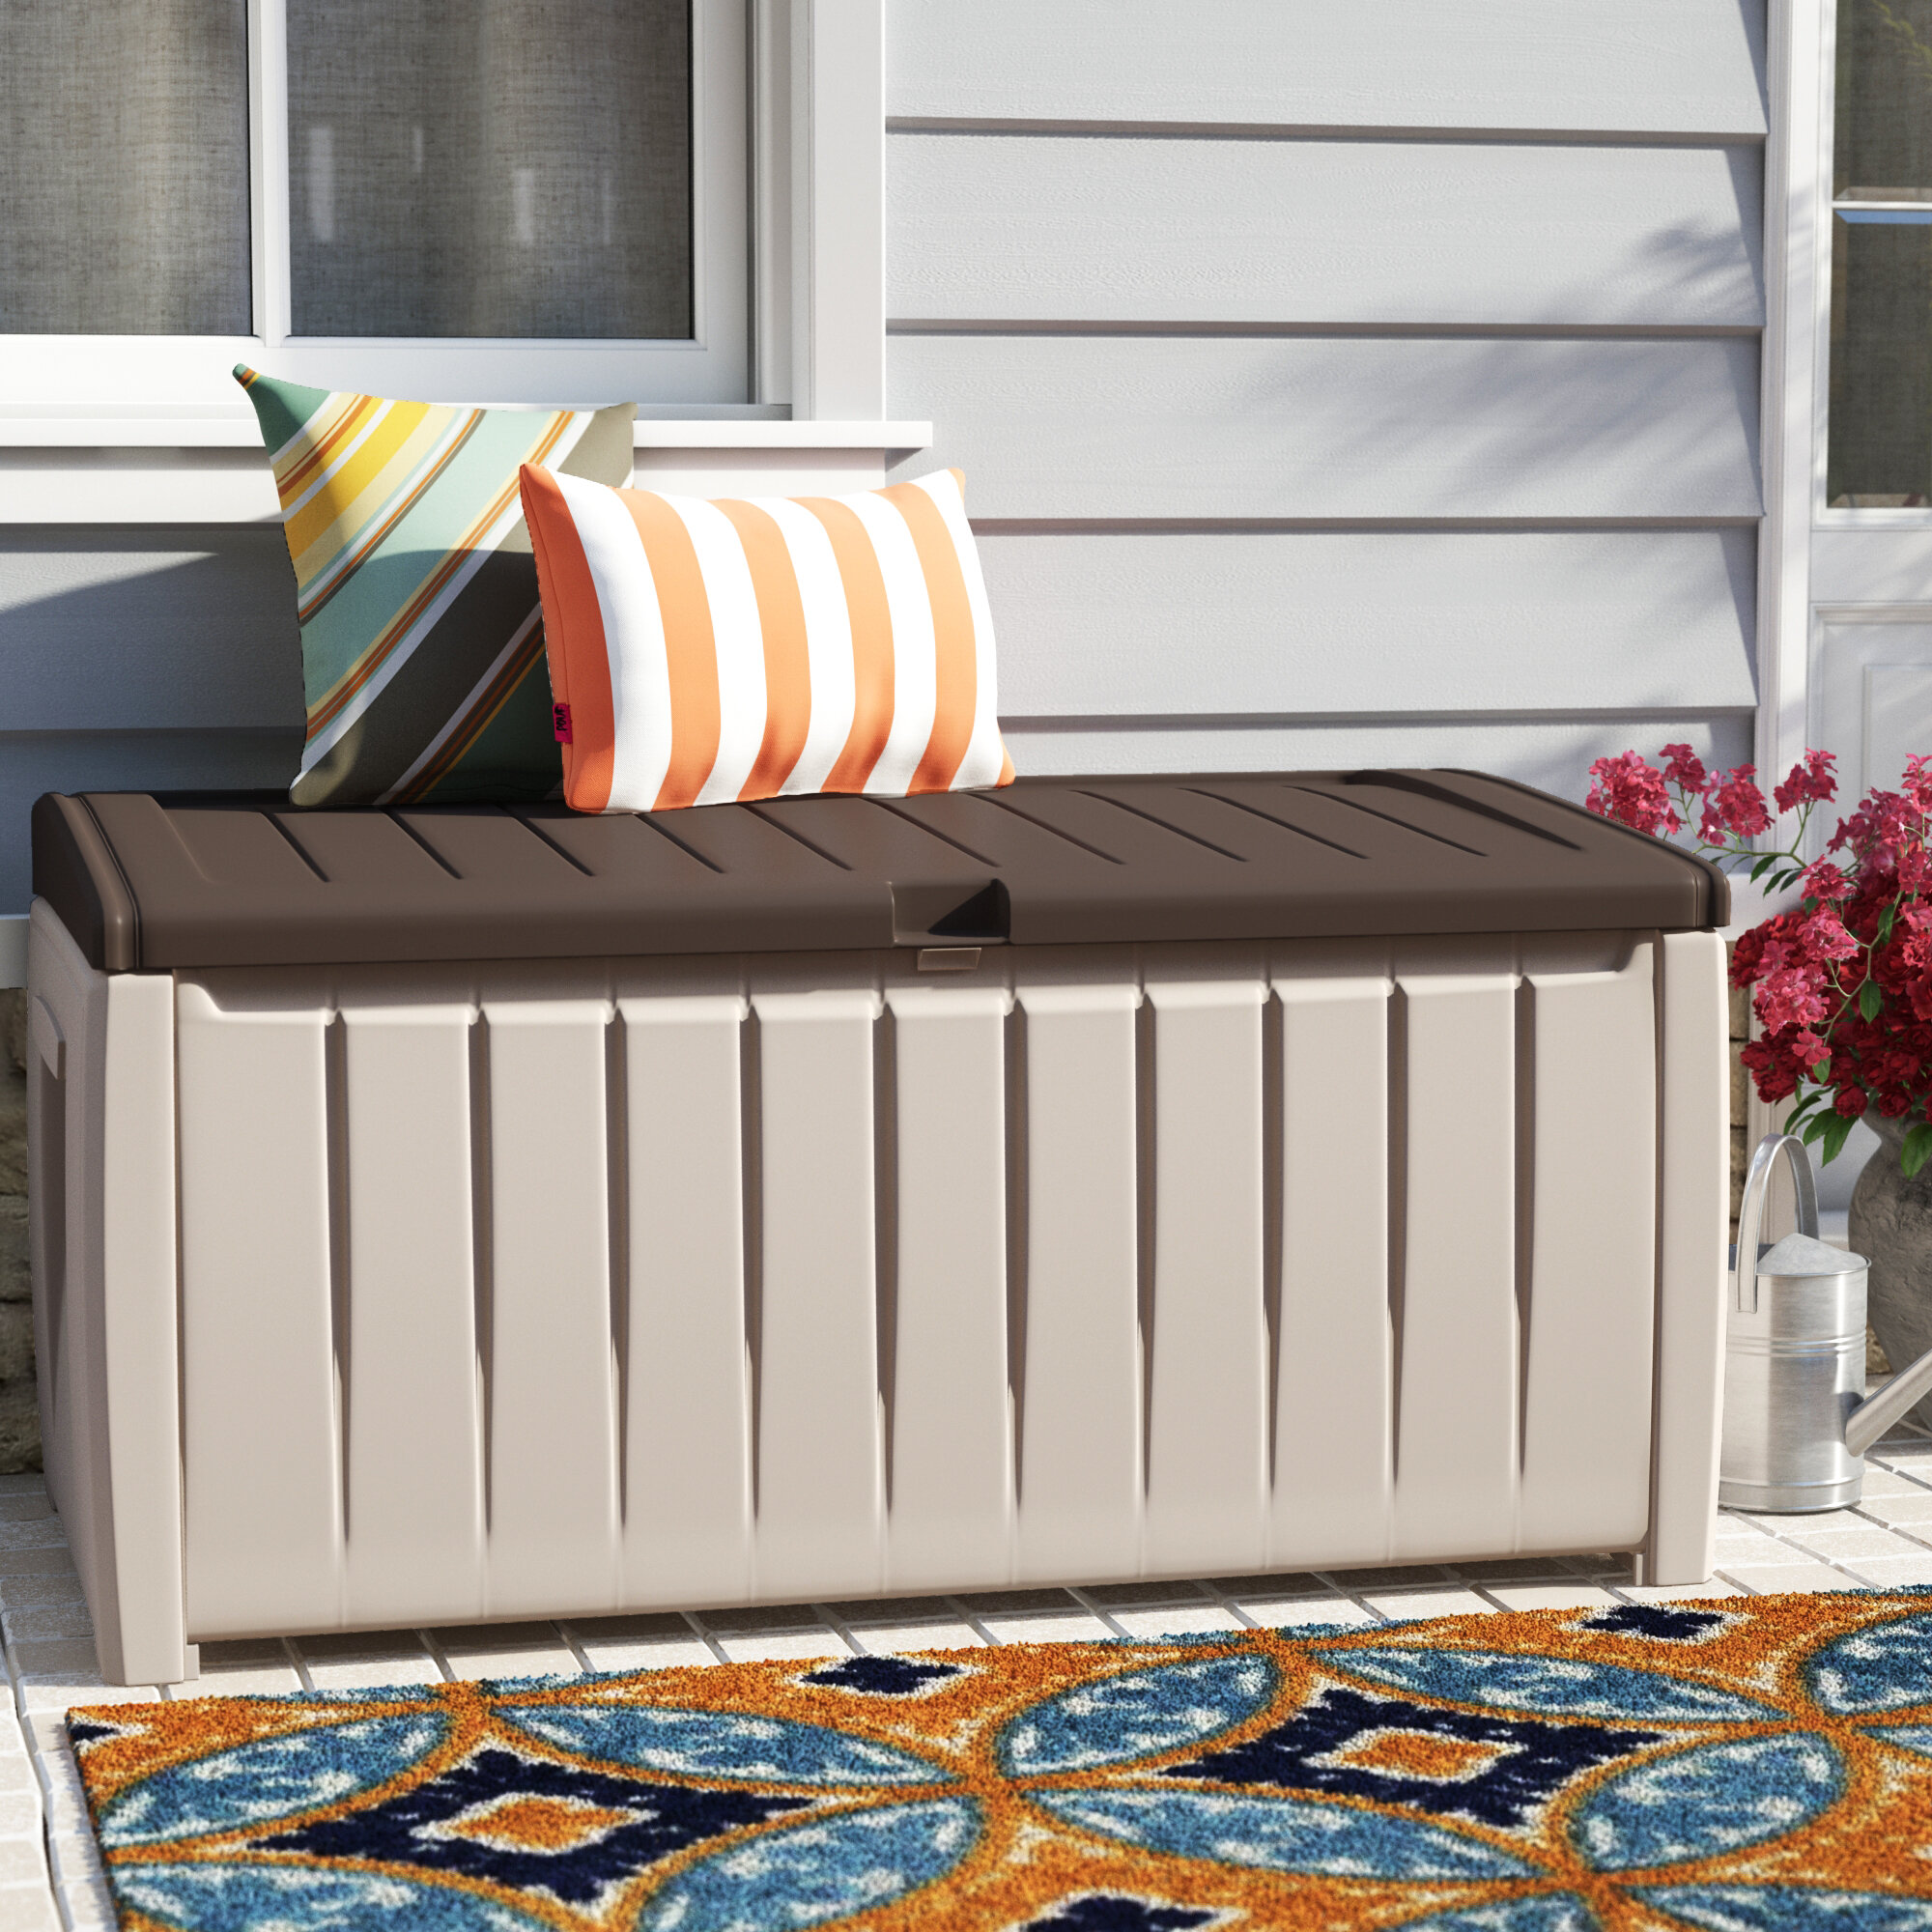 Deck Boxes Patio Storage Wayfair